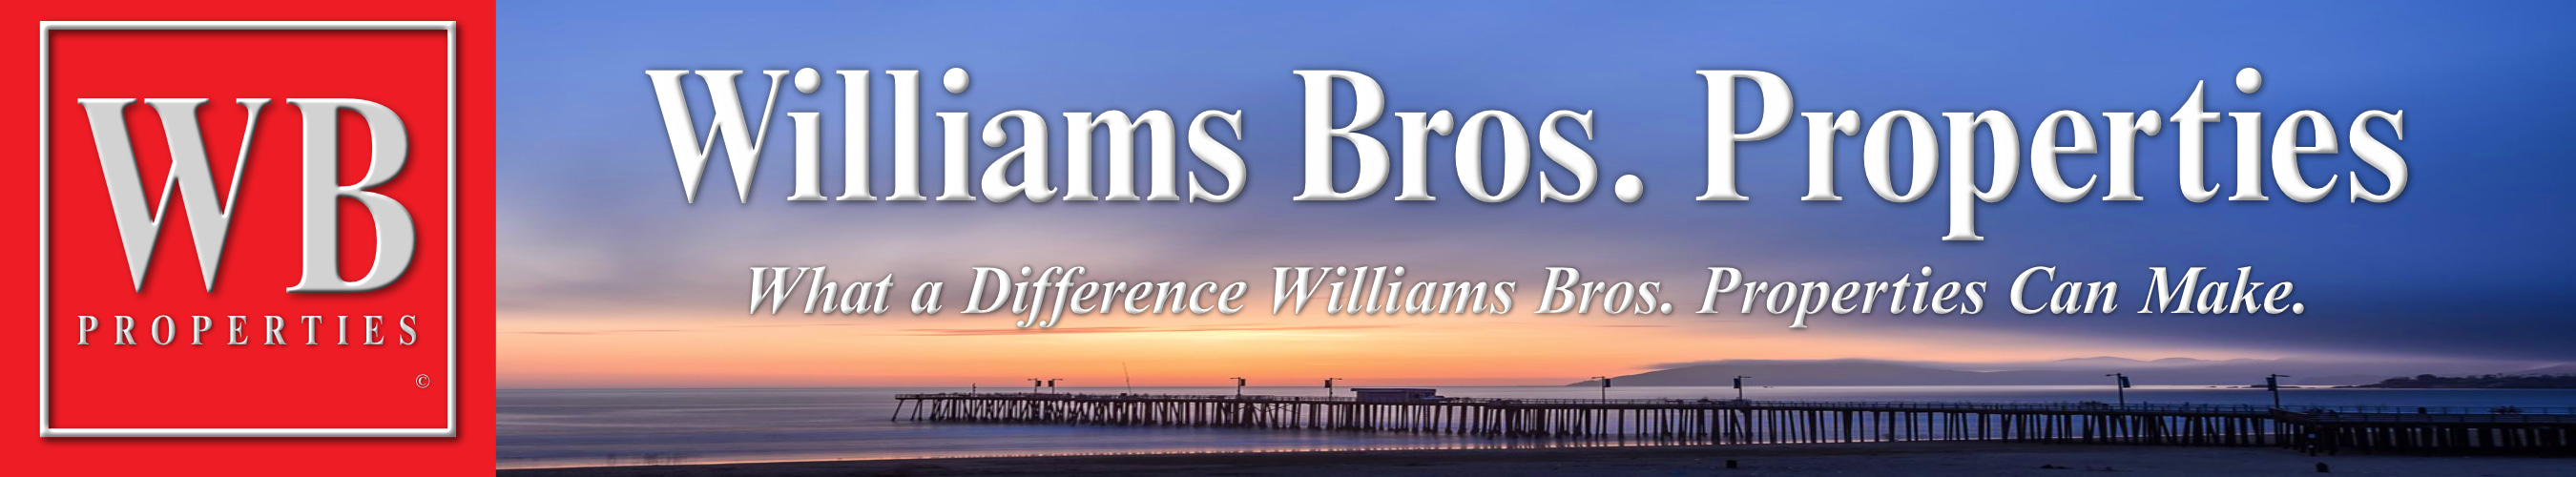 Williams Bros. Properties